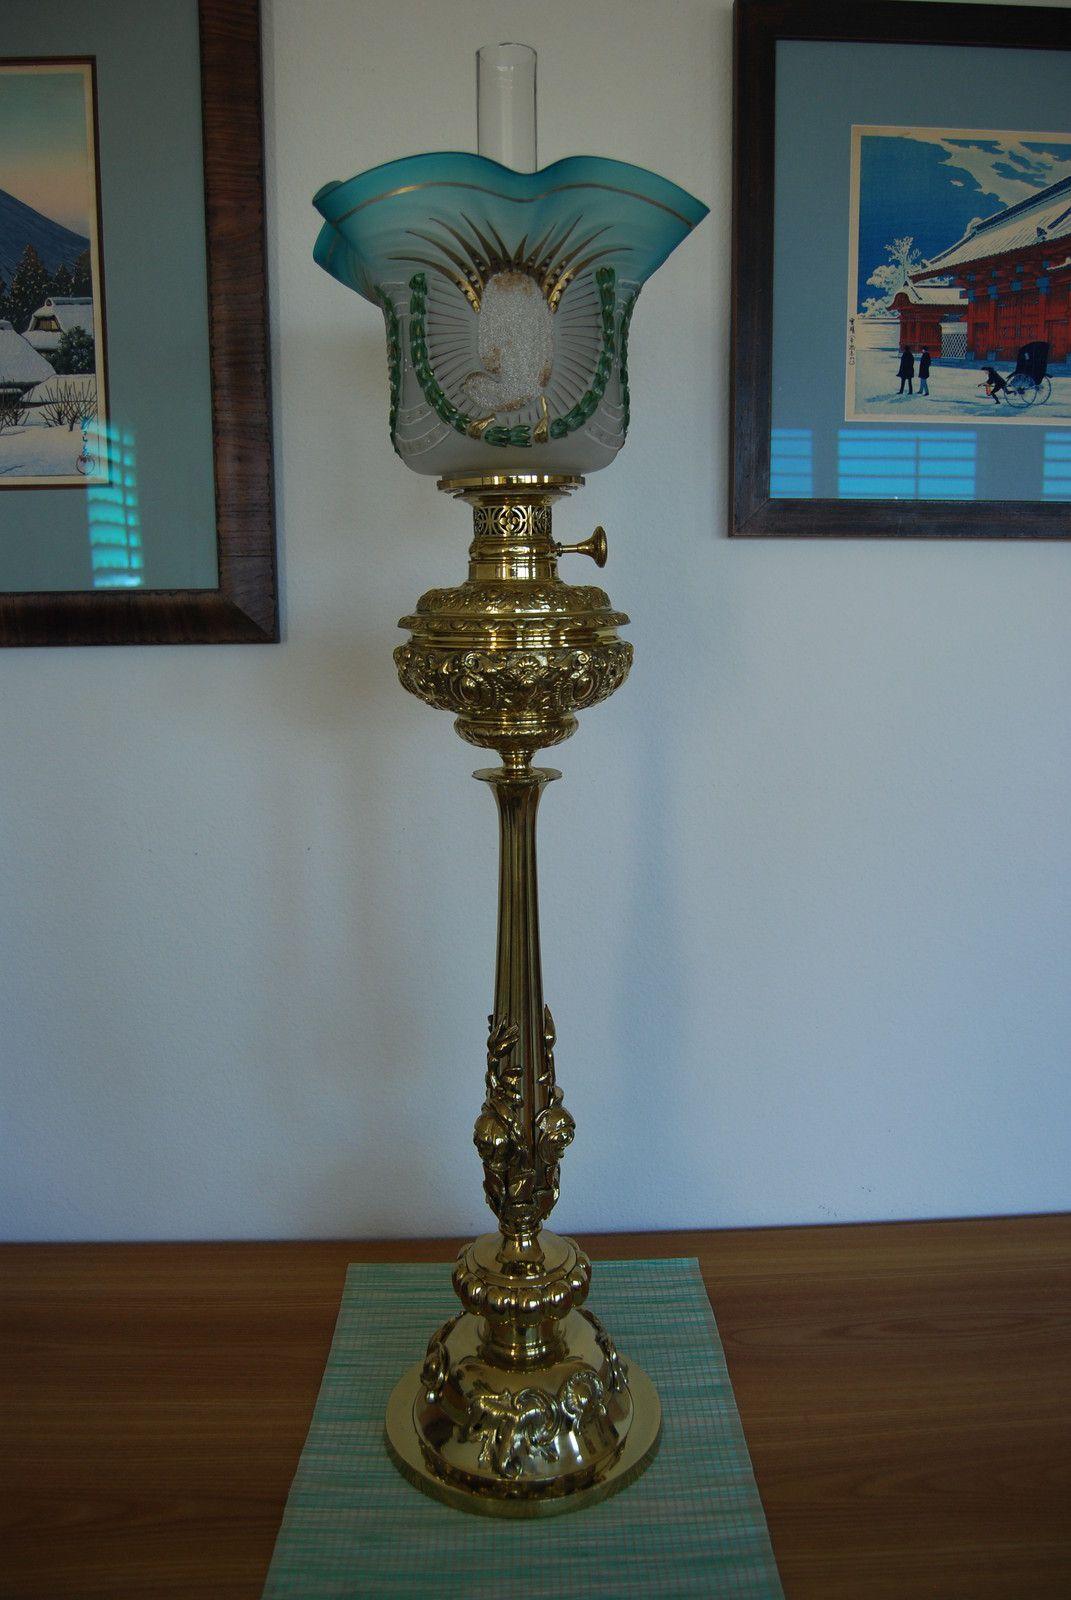 Antique Gwtw Austrian European Parlor Banquet Kerosene Oil Old Bird Shade Lamp Ebay